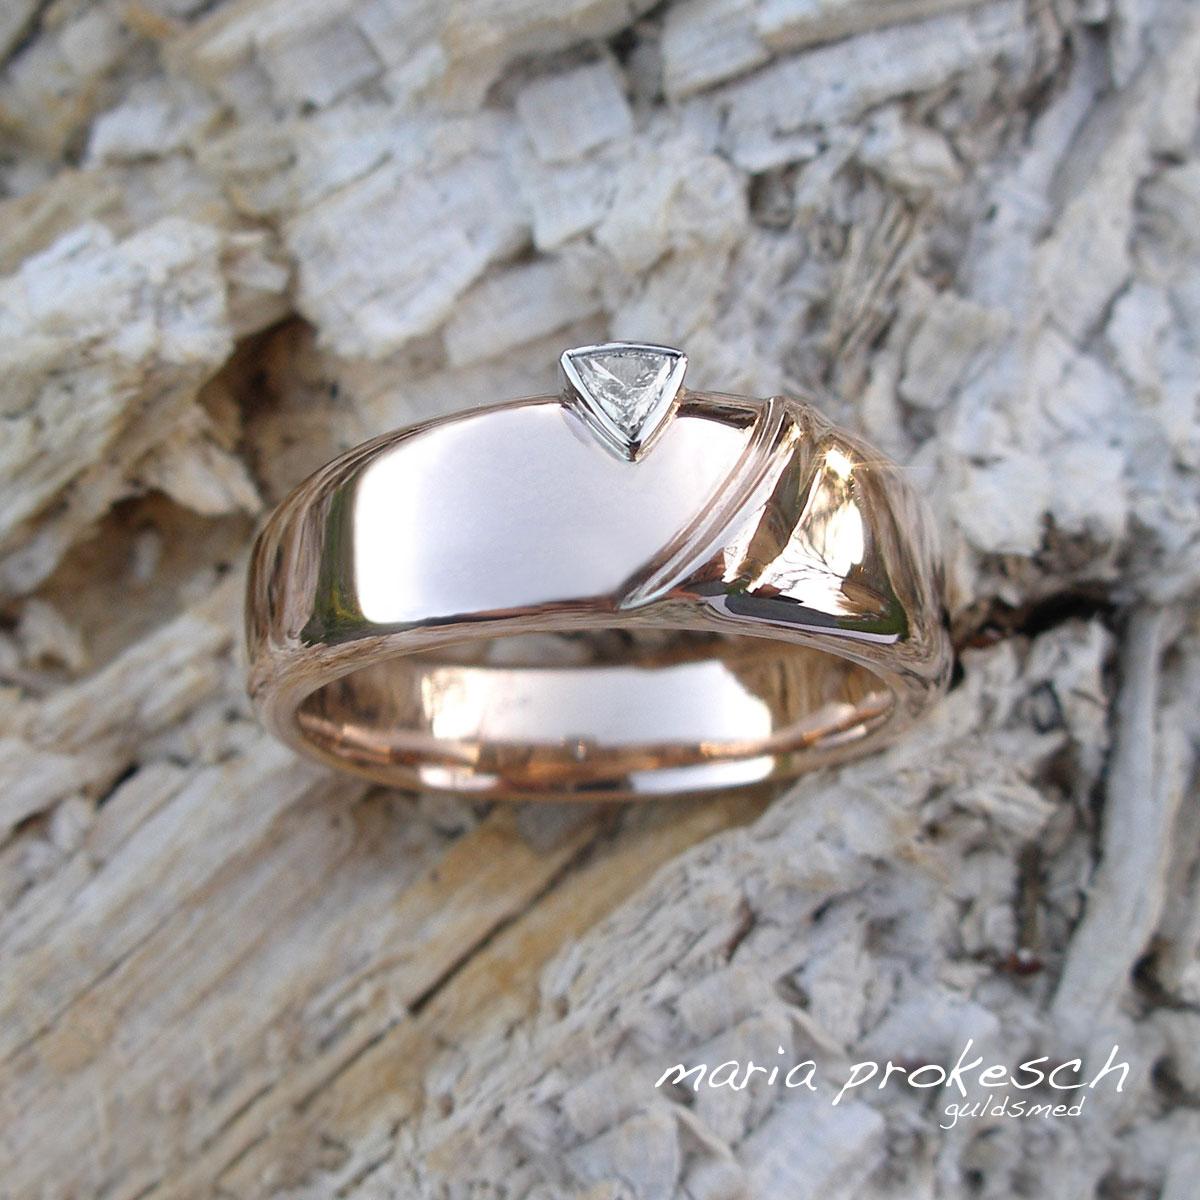 Maskulin ring i guld med trekantet diamant, trillant. Ringen til ham, når ønsket er herresmykker.